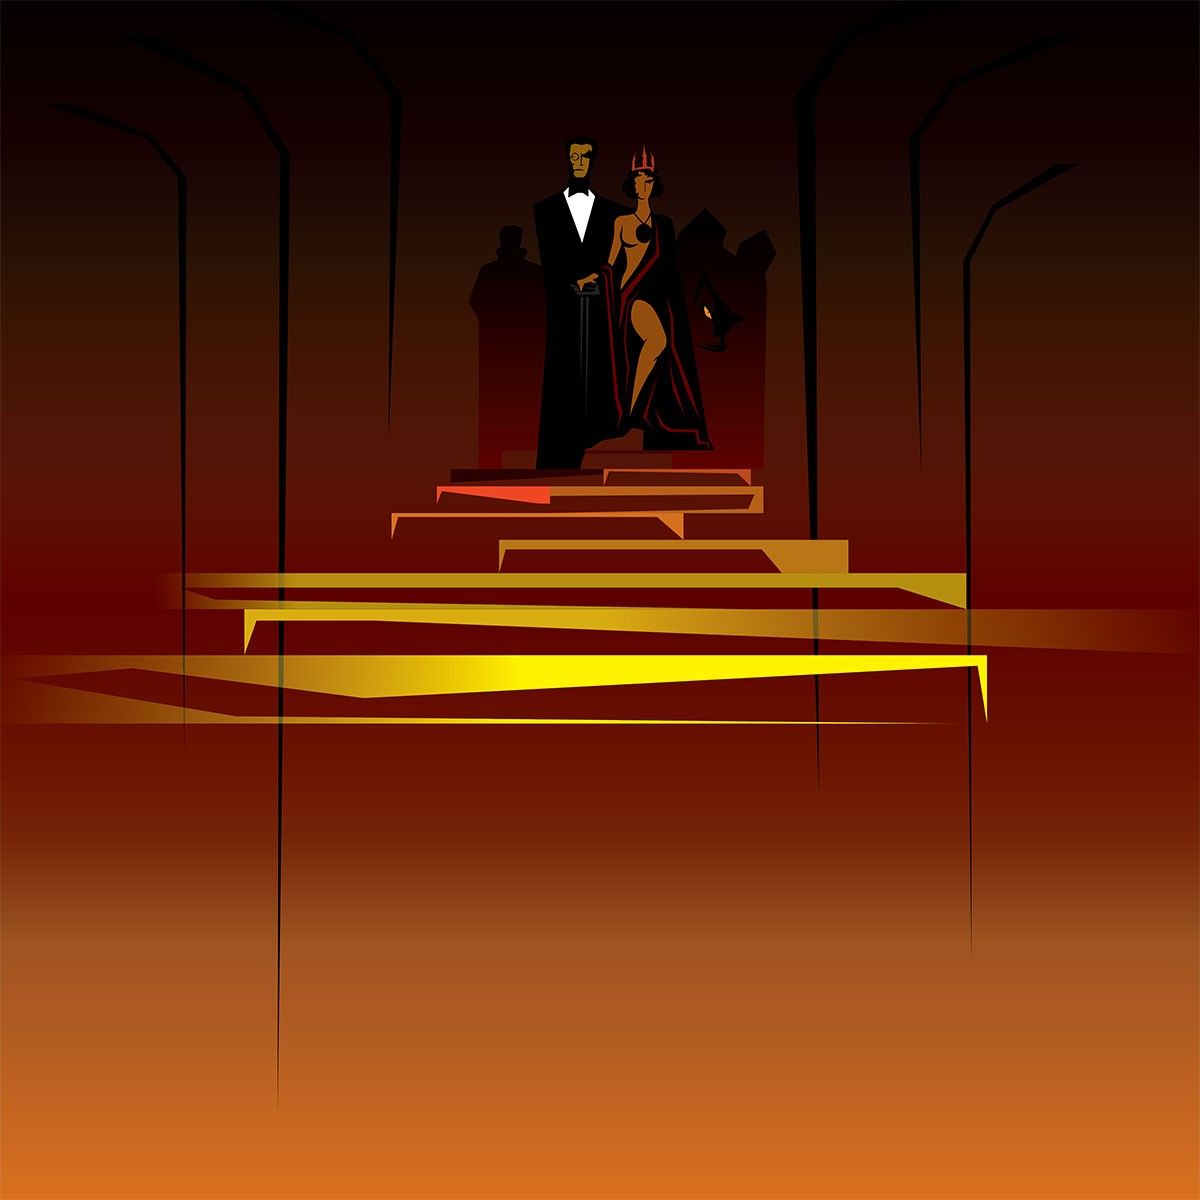 Великий бал у сатаны иллюстрация Дария Асадуллаева